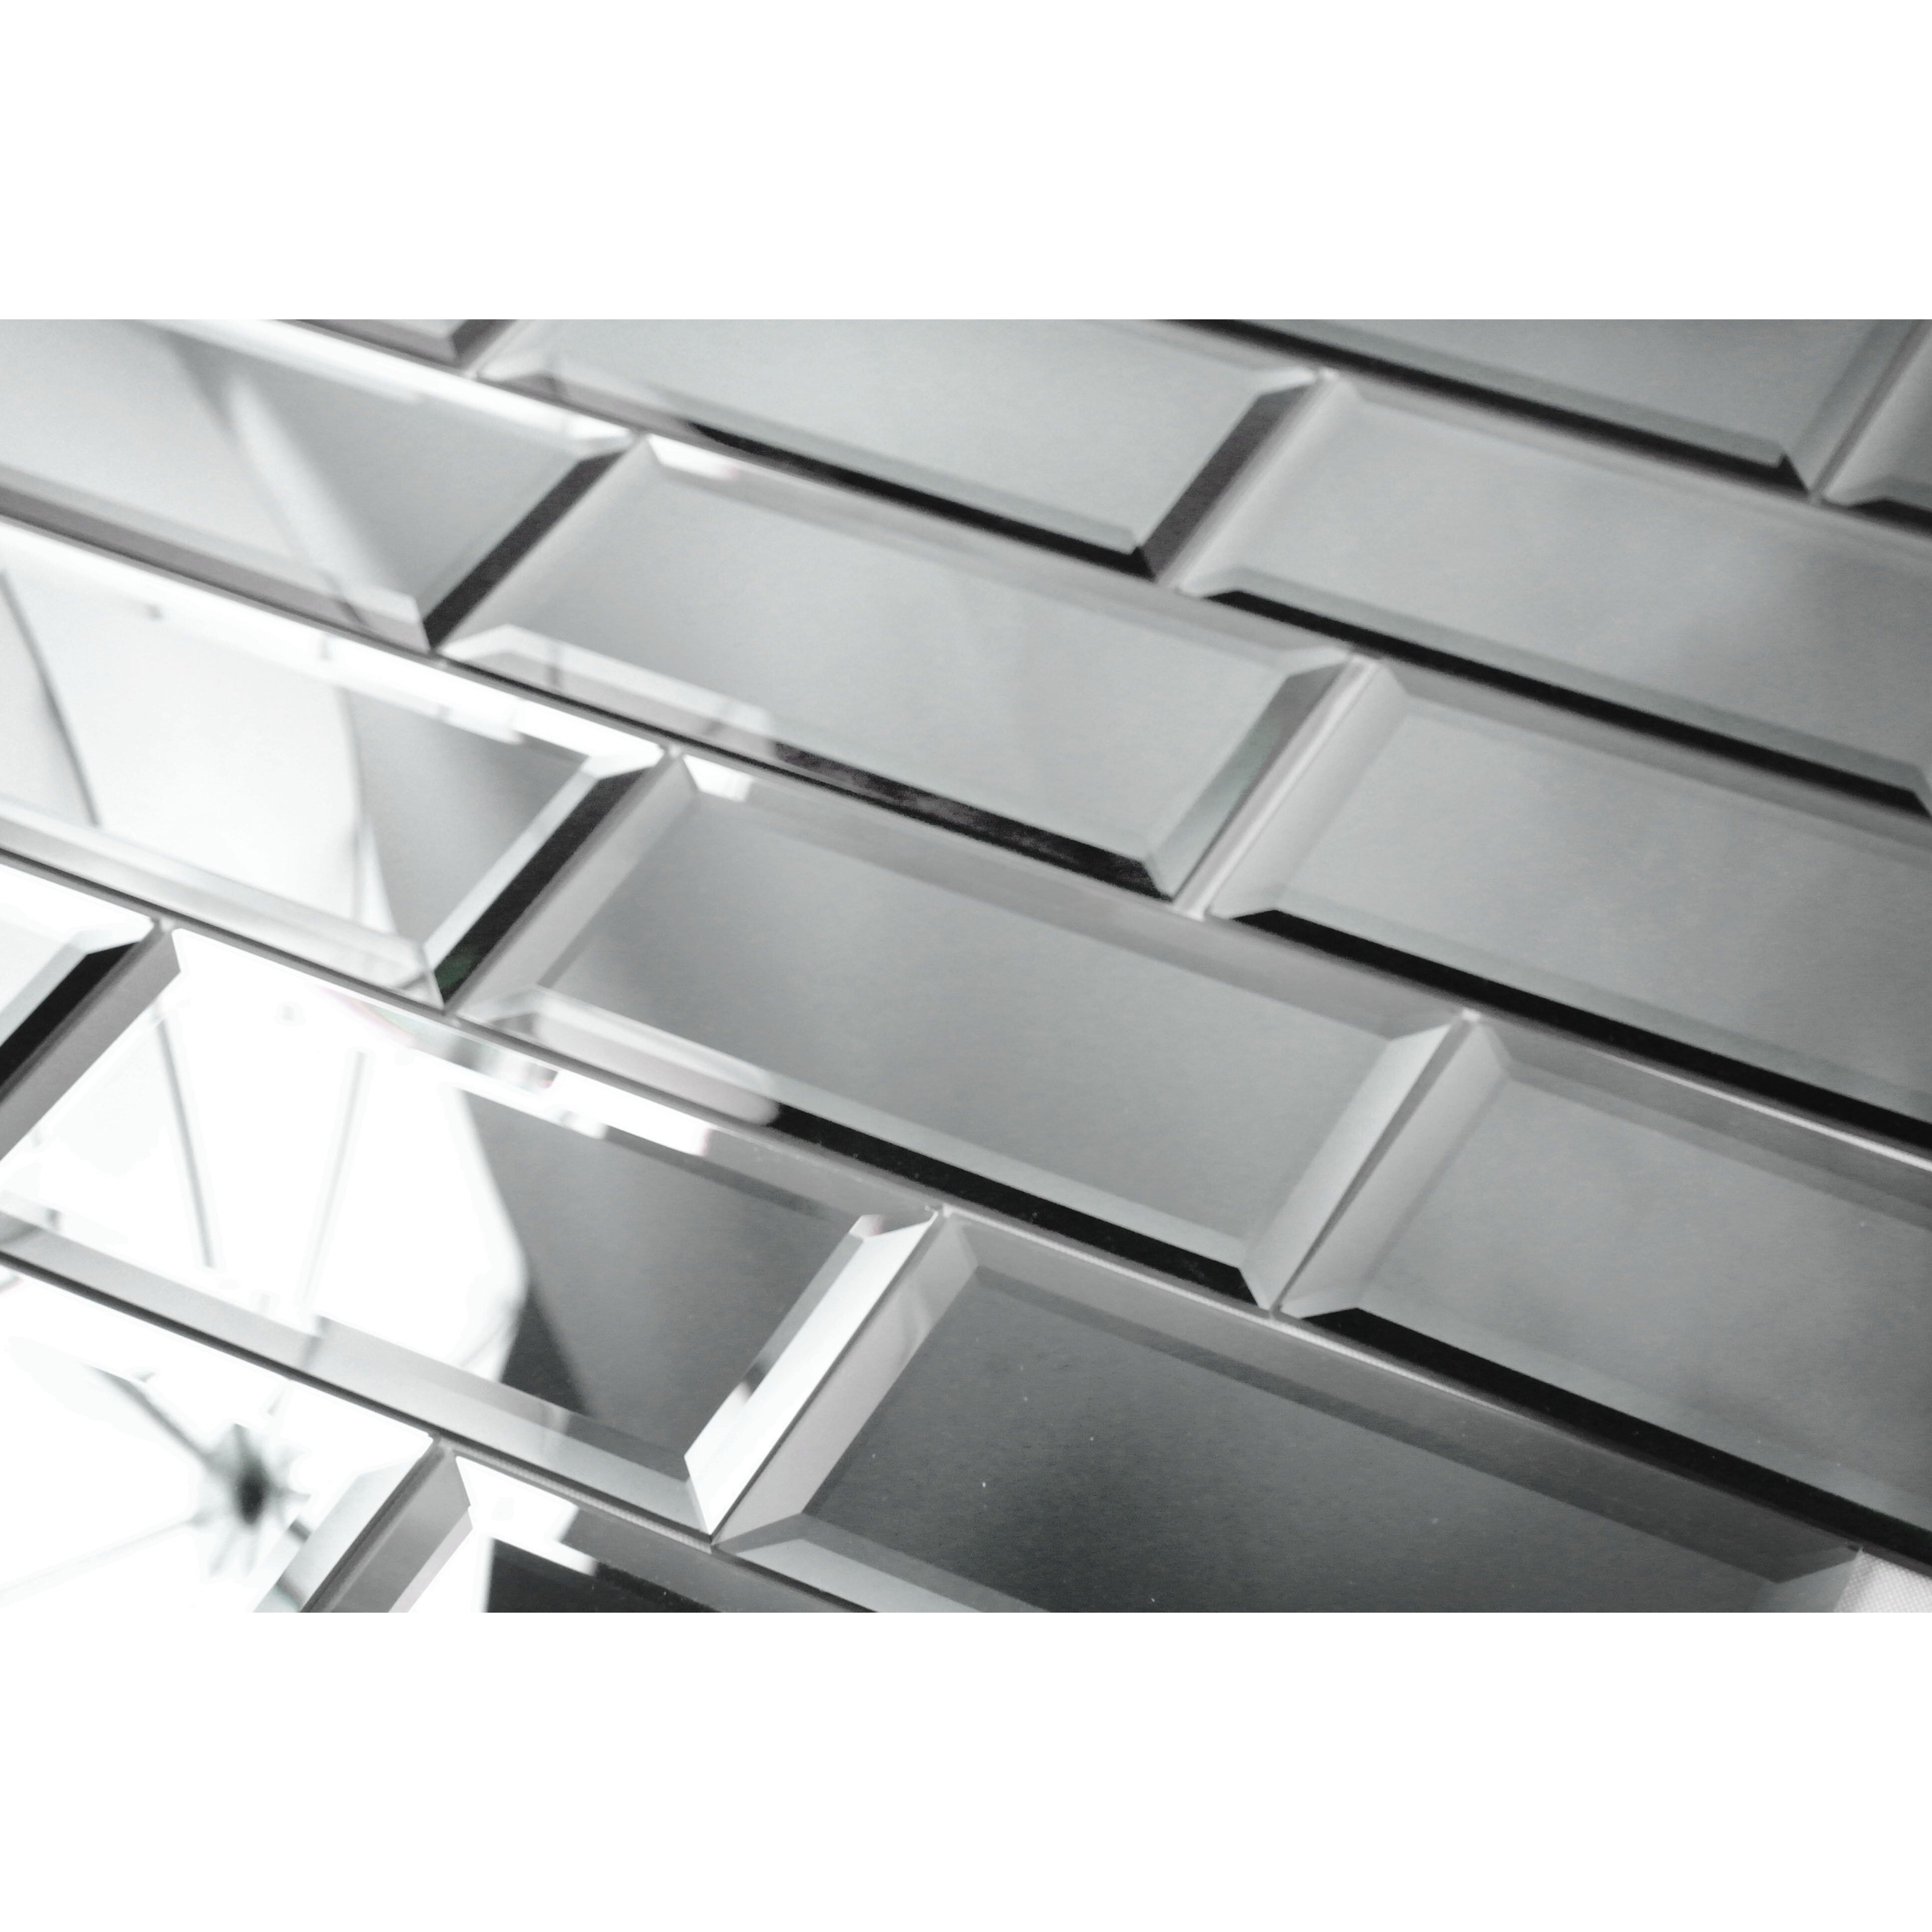 abolos echo 3 x 6 mirror glass subway tile in graphite peel stick reviews wayfair. Black Bedroom Furniture Sets. Home Design Ideas